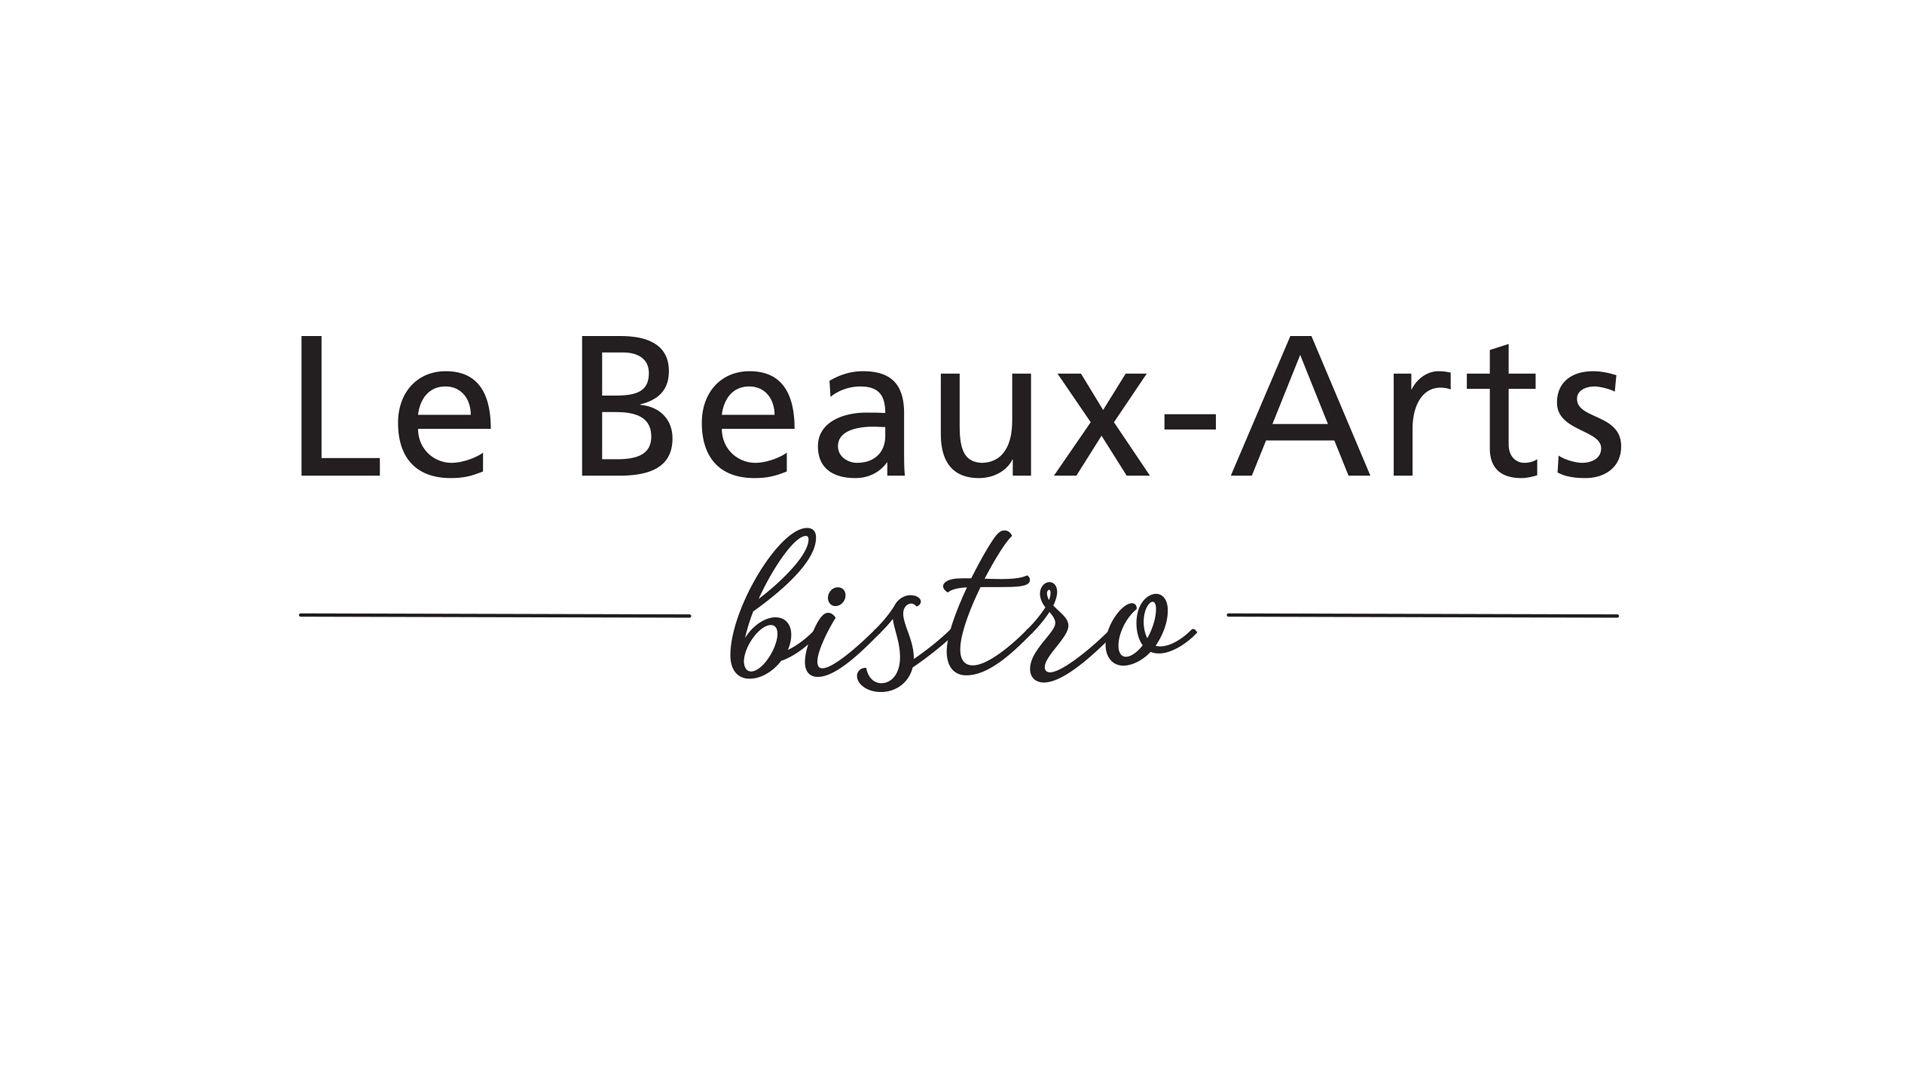 The Beaux-Arts Bistro